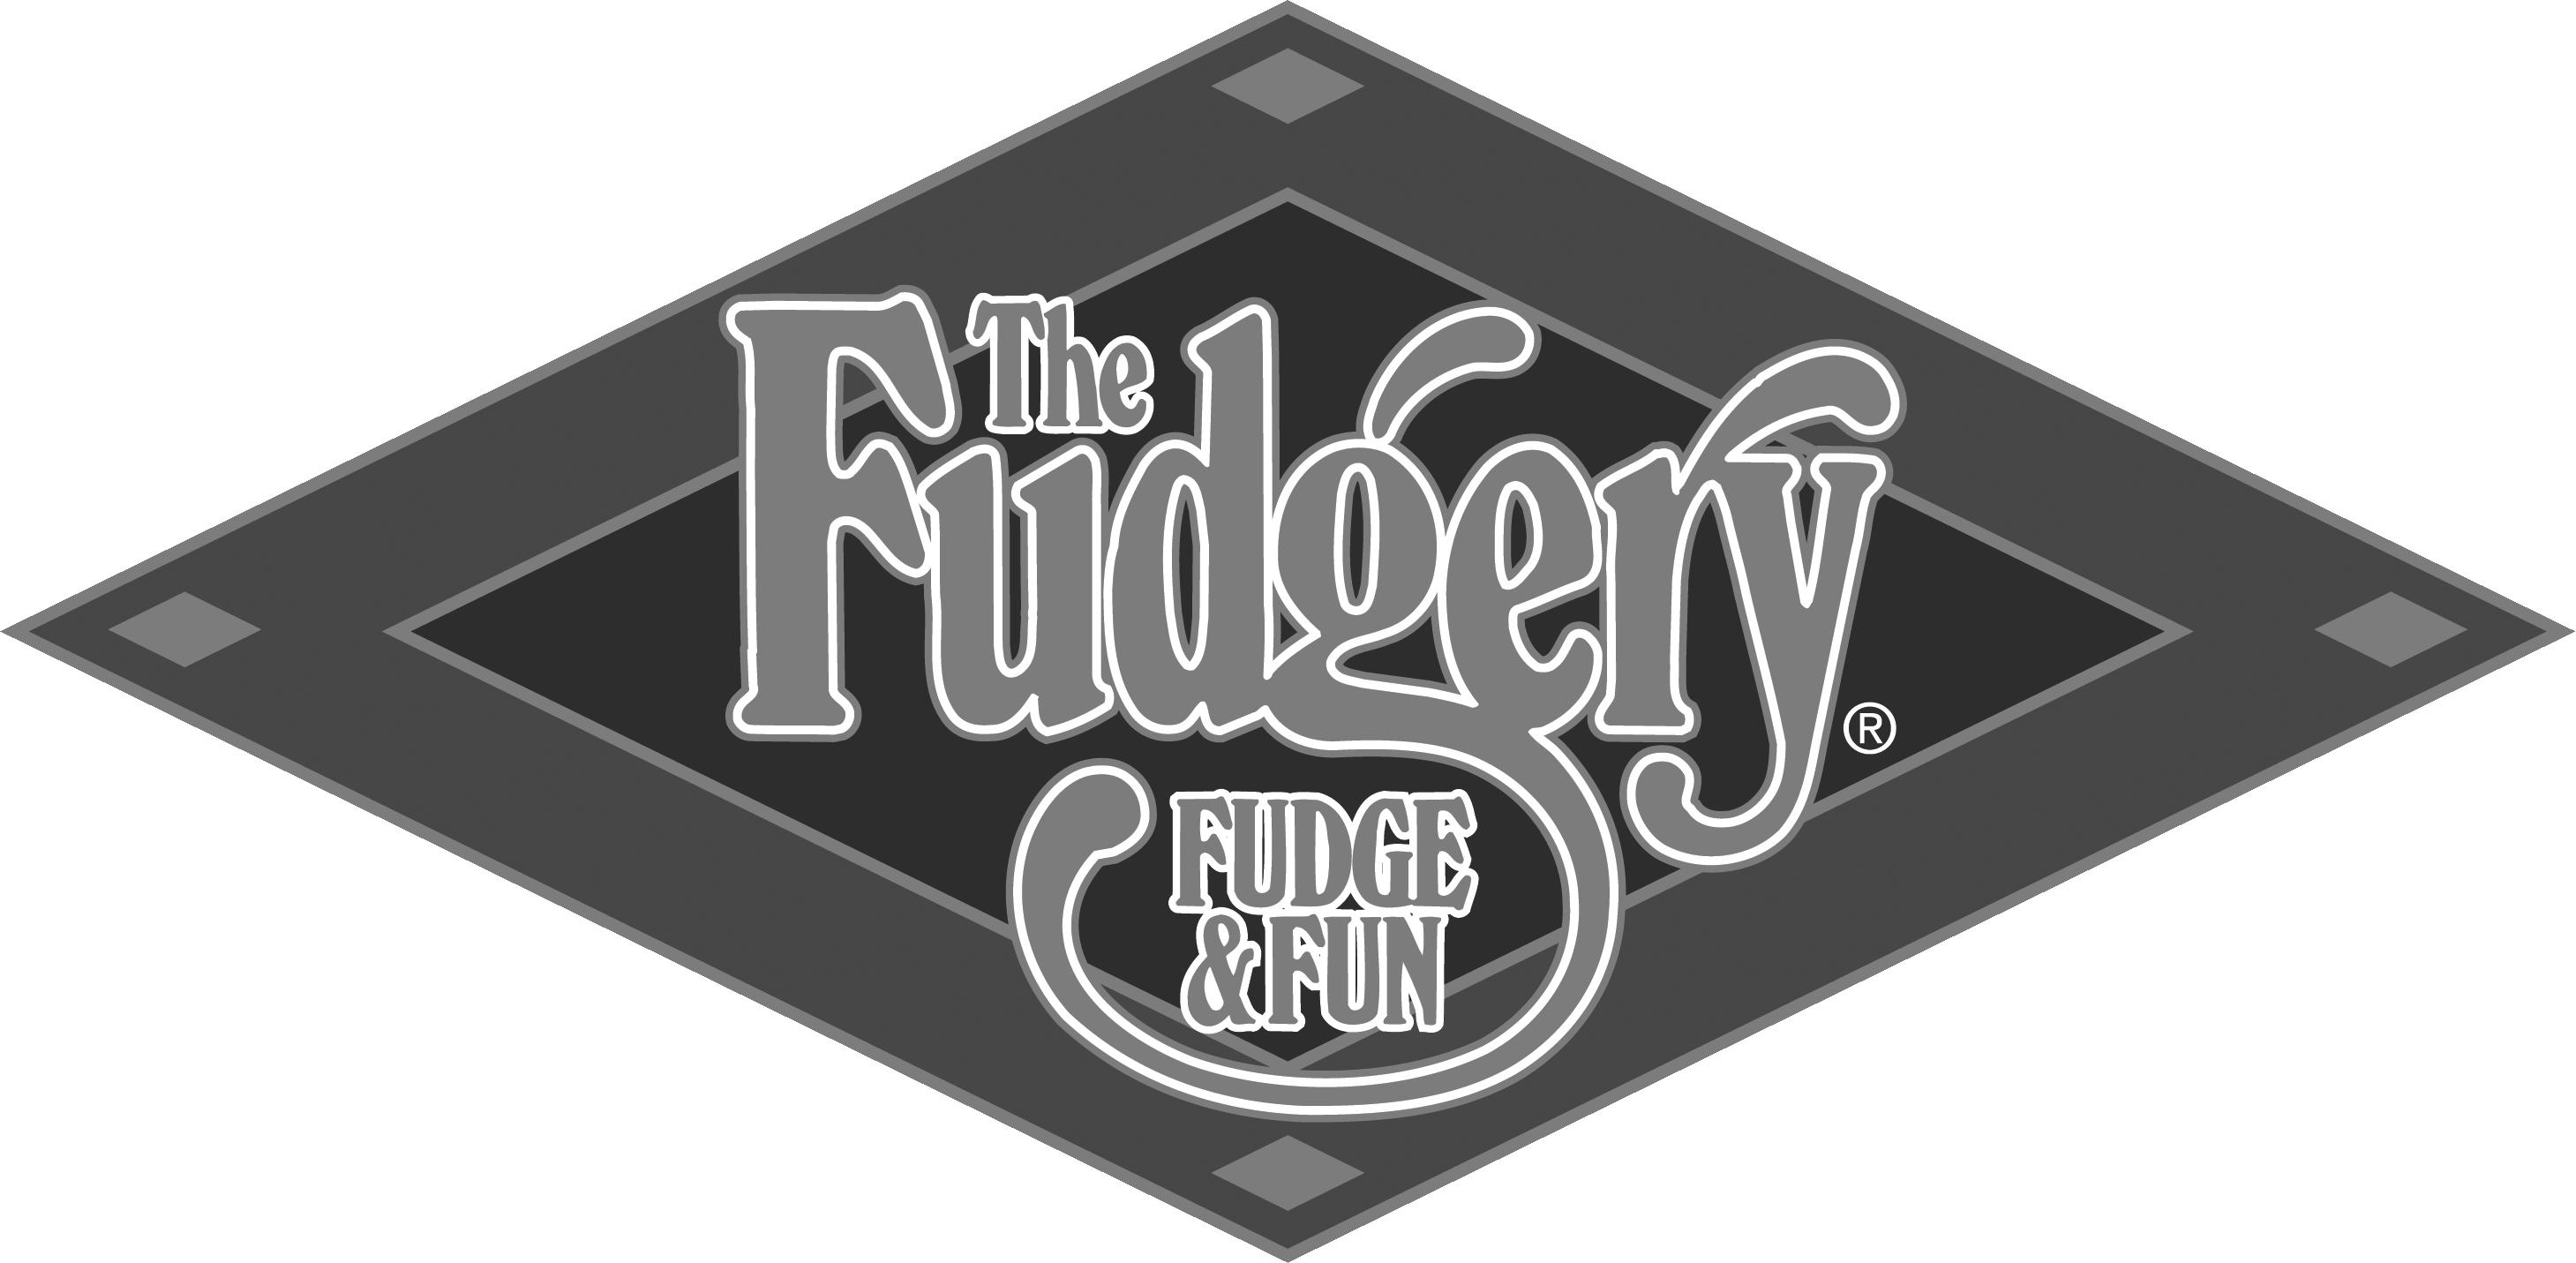 Fudgery